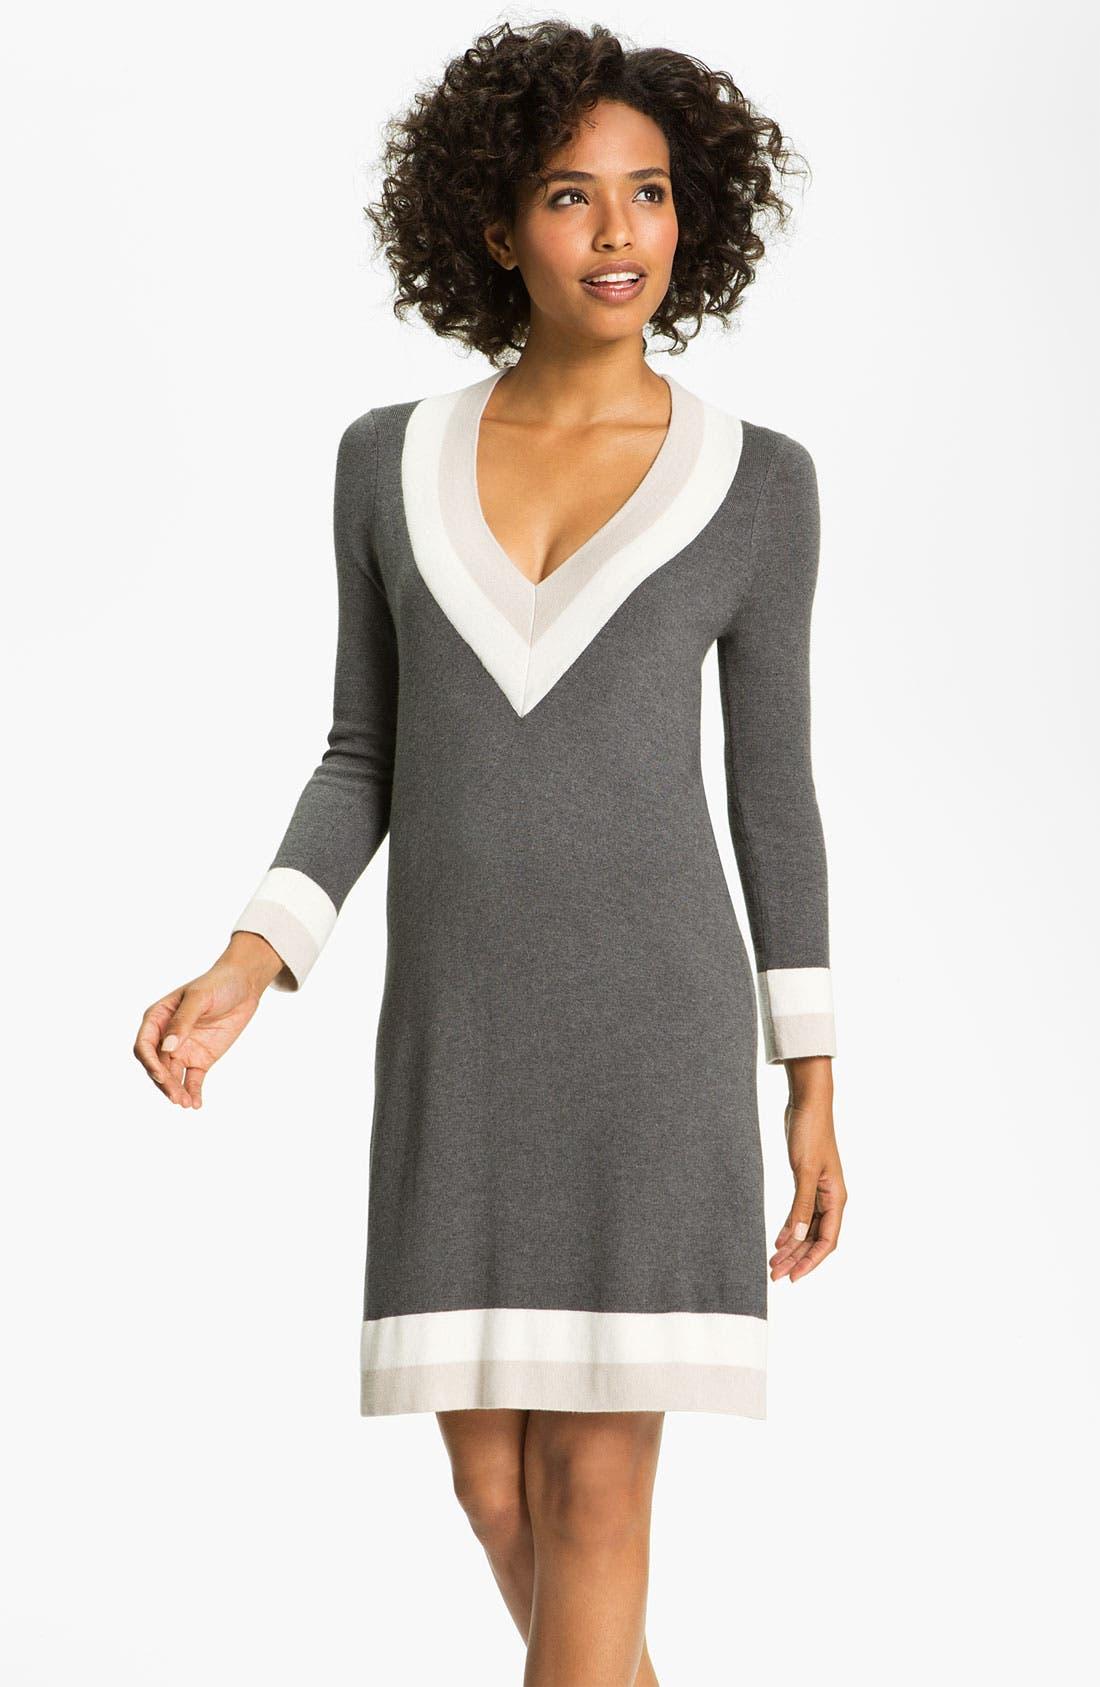 Alternate Image 1 Selected - Felicity & Coco Colorblock V-Neck Sweater Dress (Regular & Petite) (Nordstrom Exclusive)